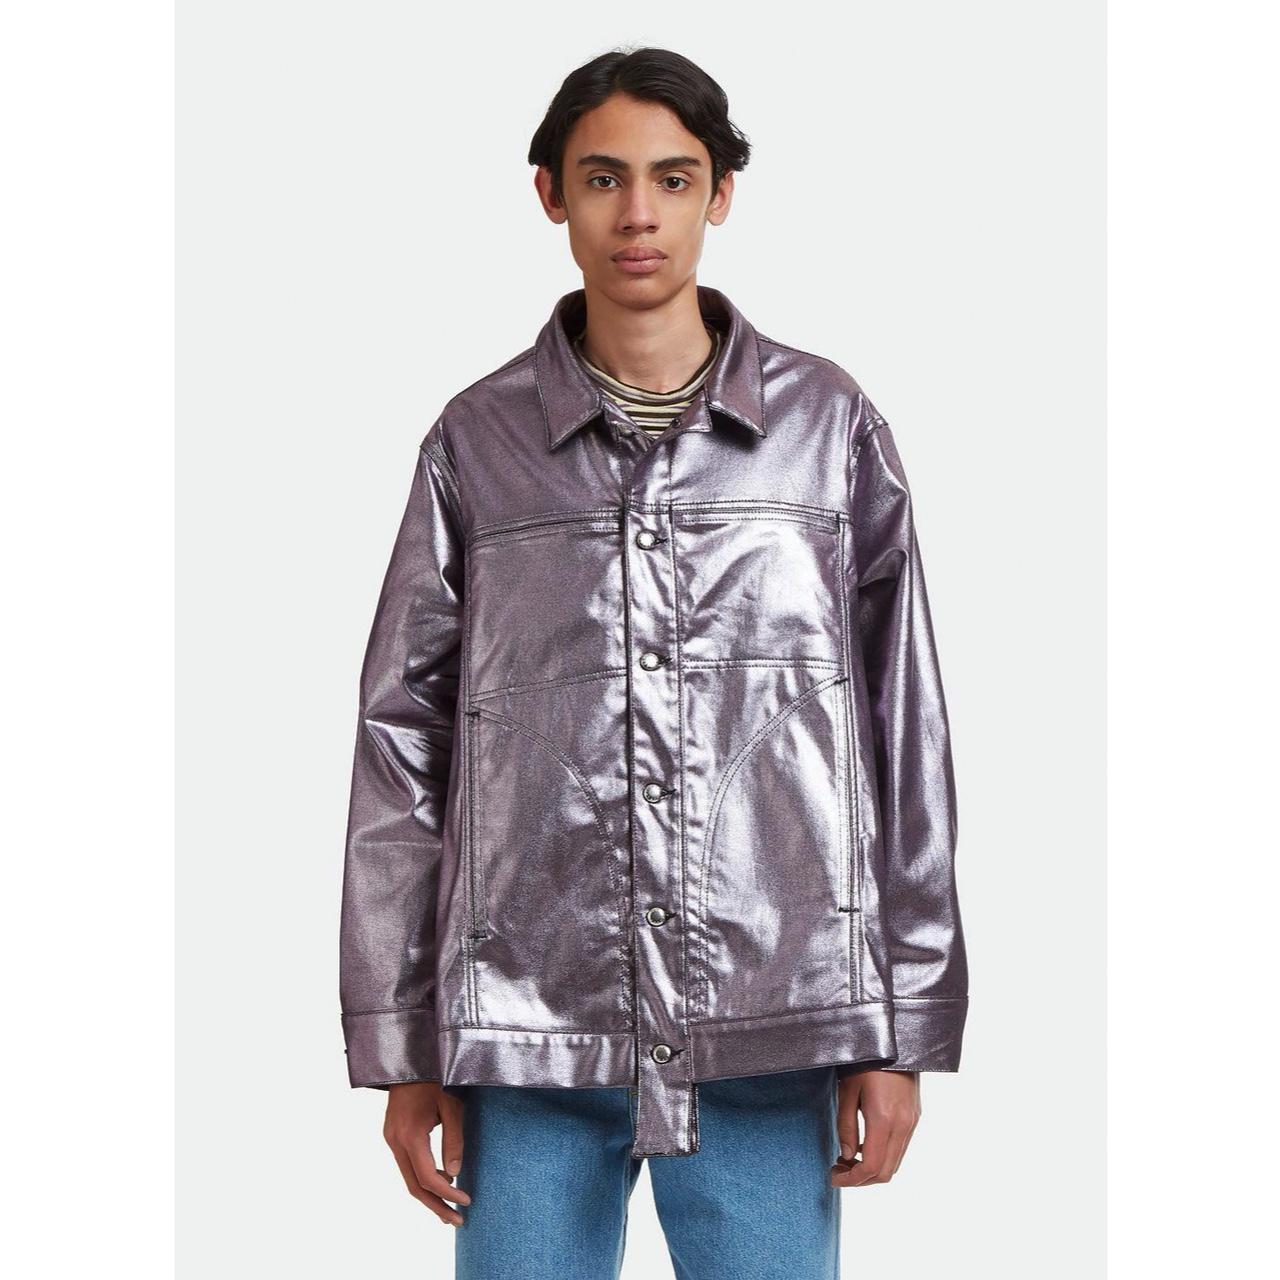 Product Image 1 - Eckhaus Latta jean jacket with